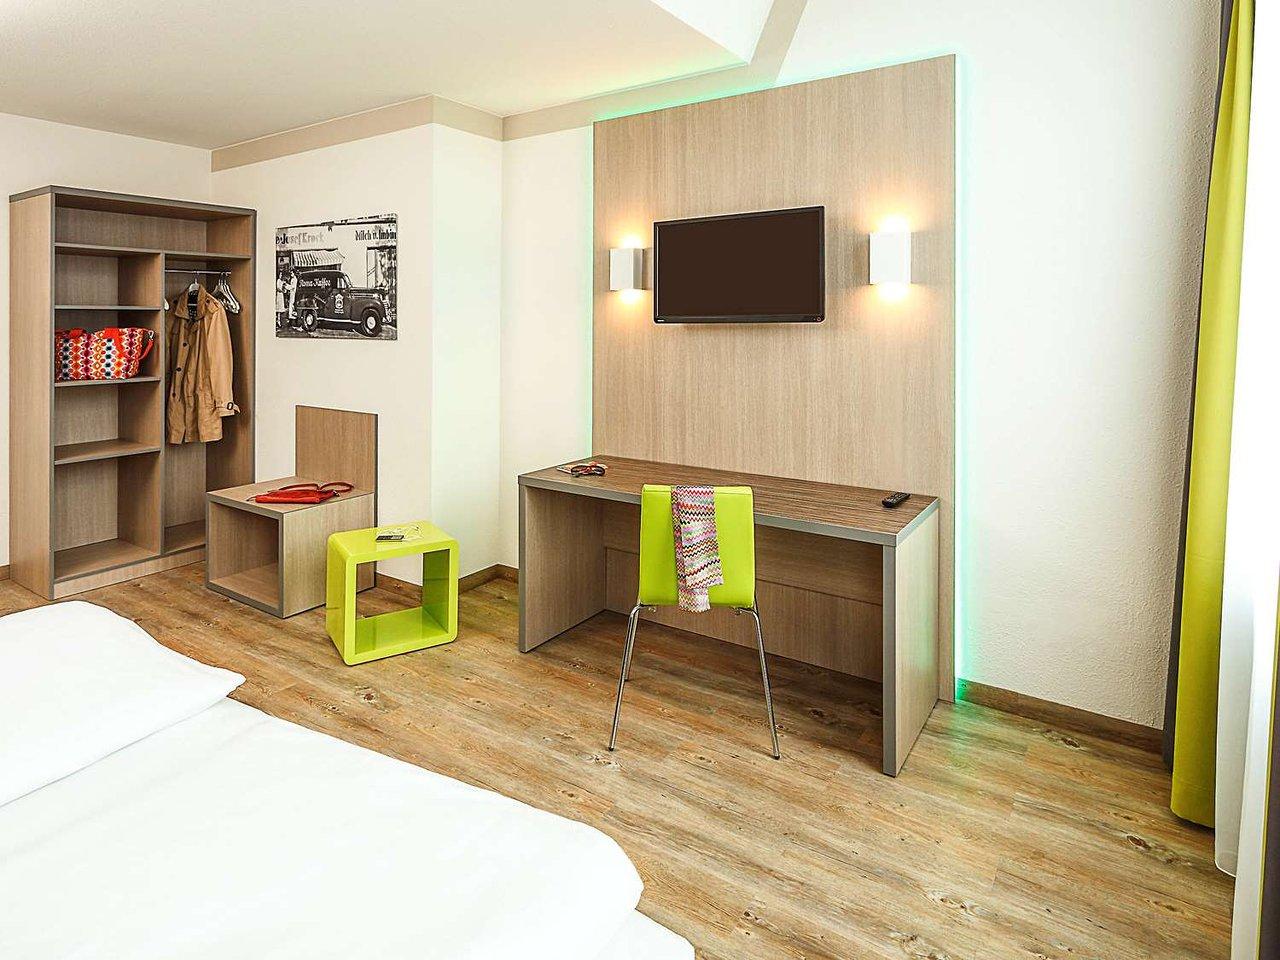 ibis bochum hauptbahnhof 77 8 7 updated 2019 prices hotel rh tripadvisor com